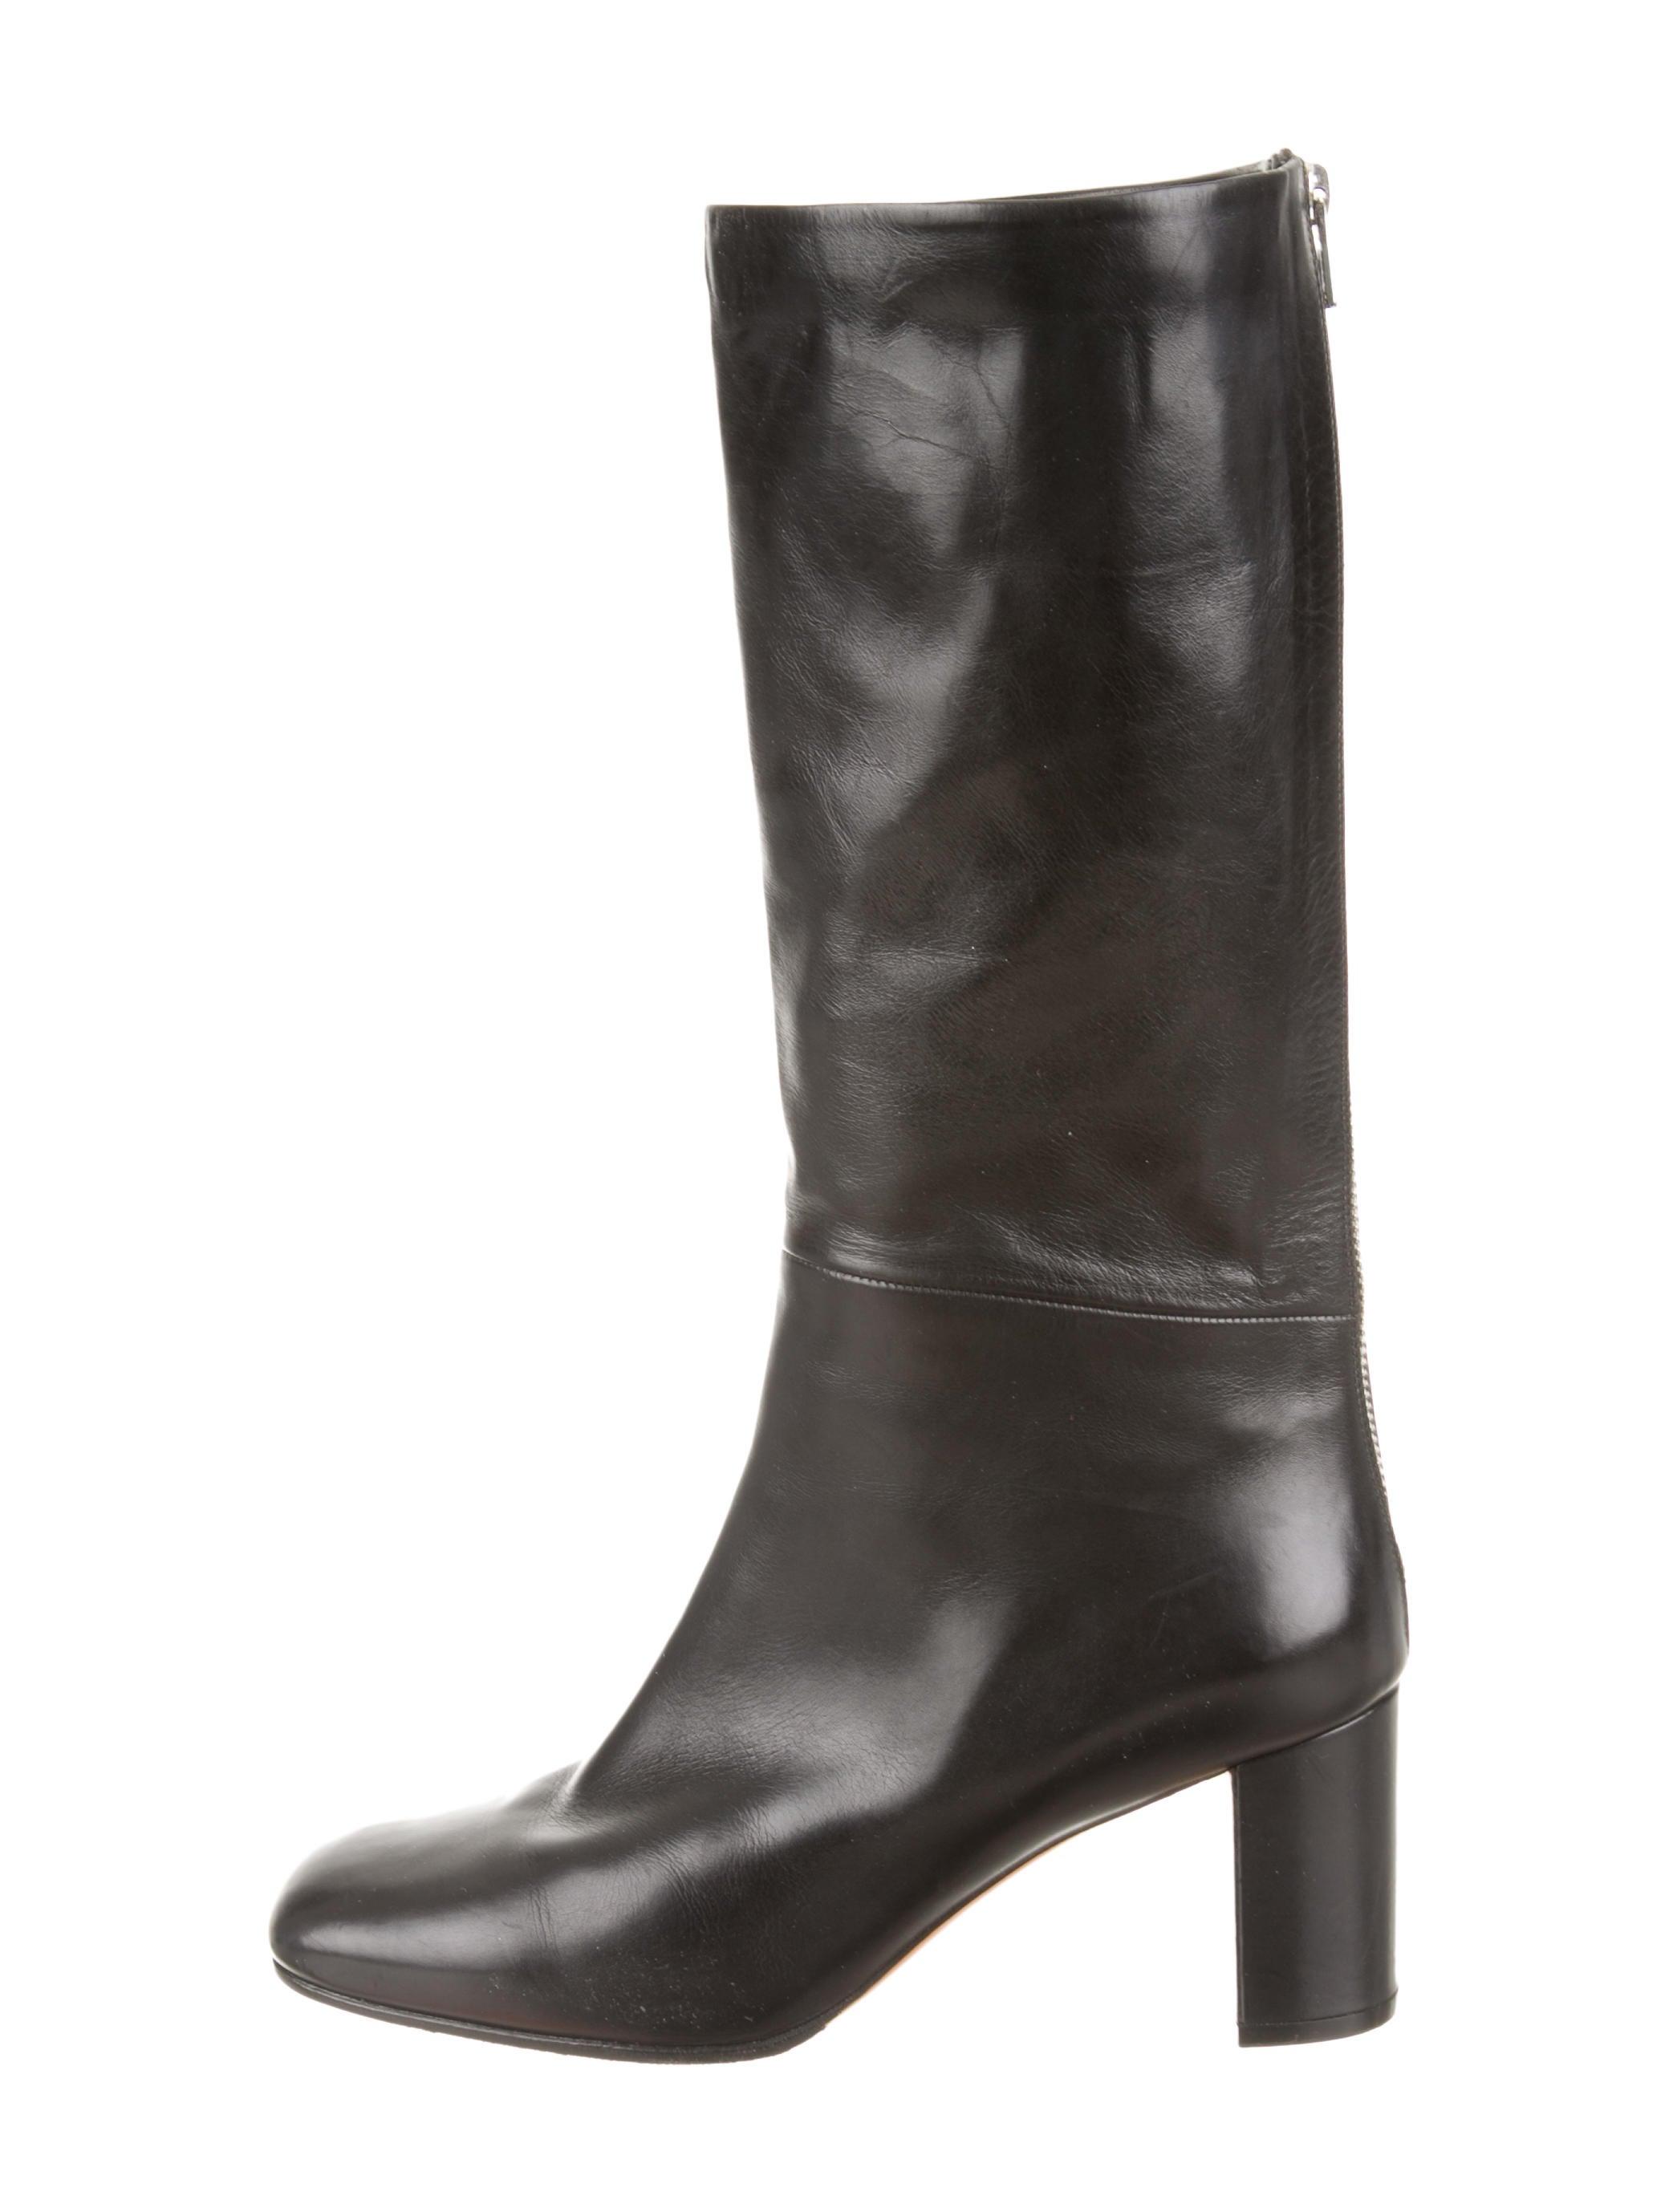 outlet nicekicks Céline Leather Square-Toe Boots sneakernews online LjAufxjwk